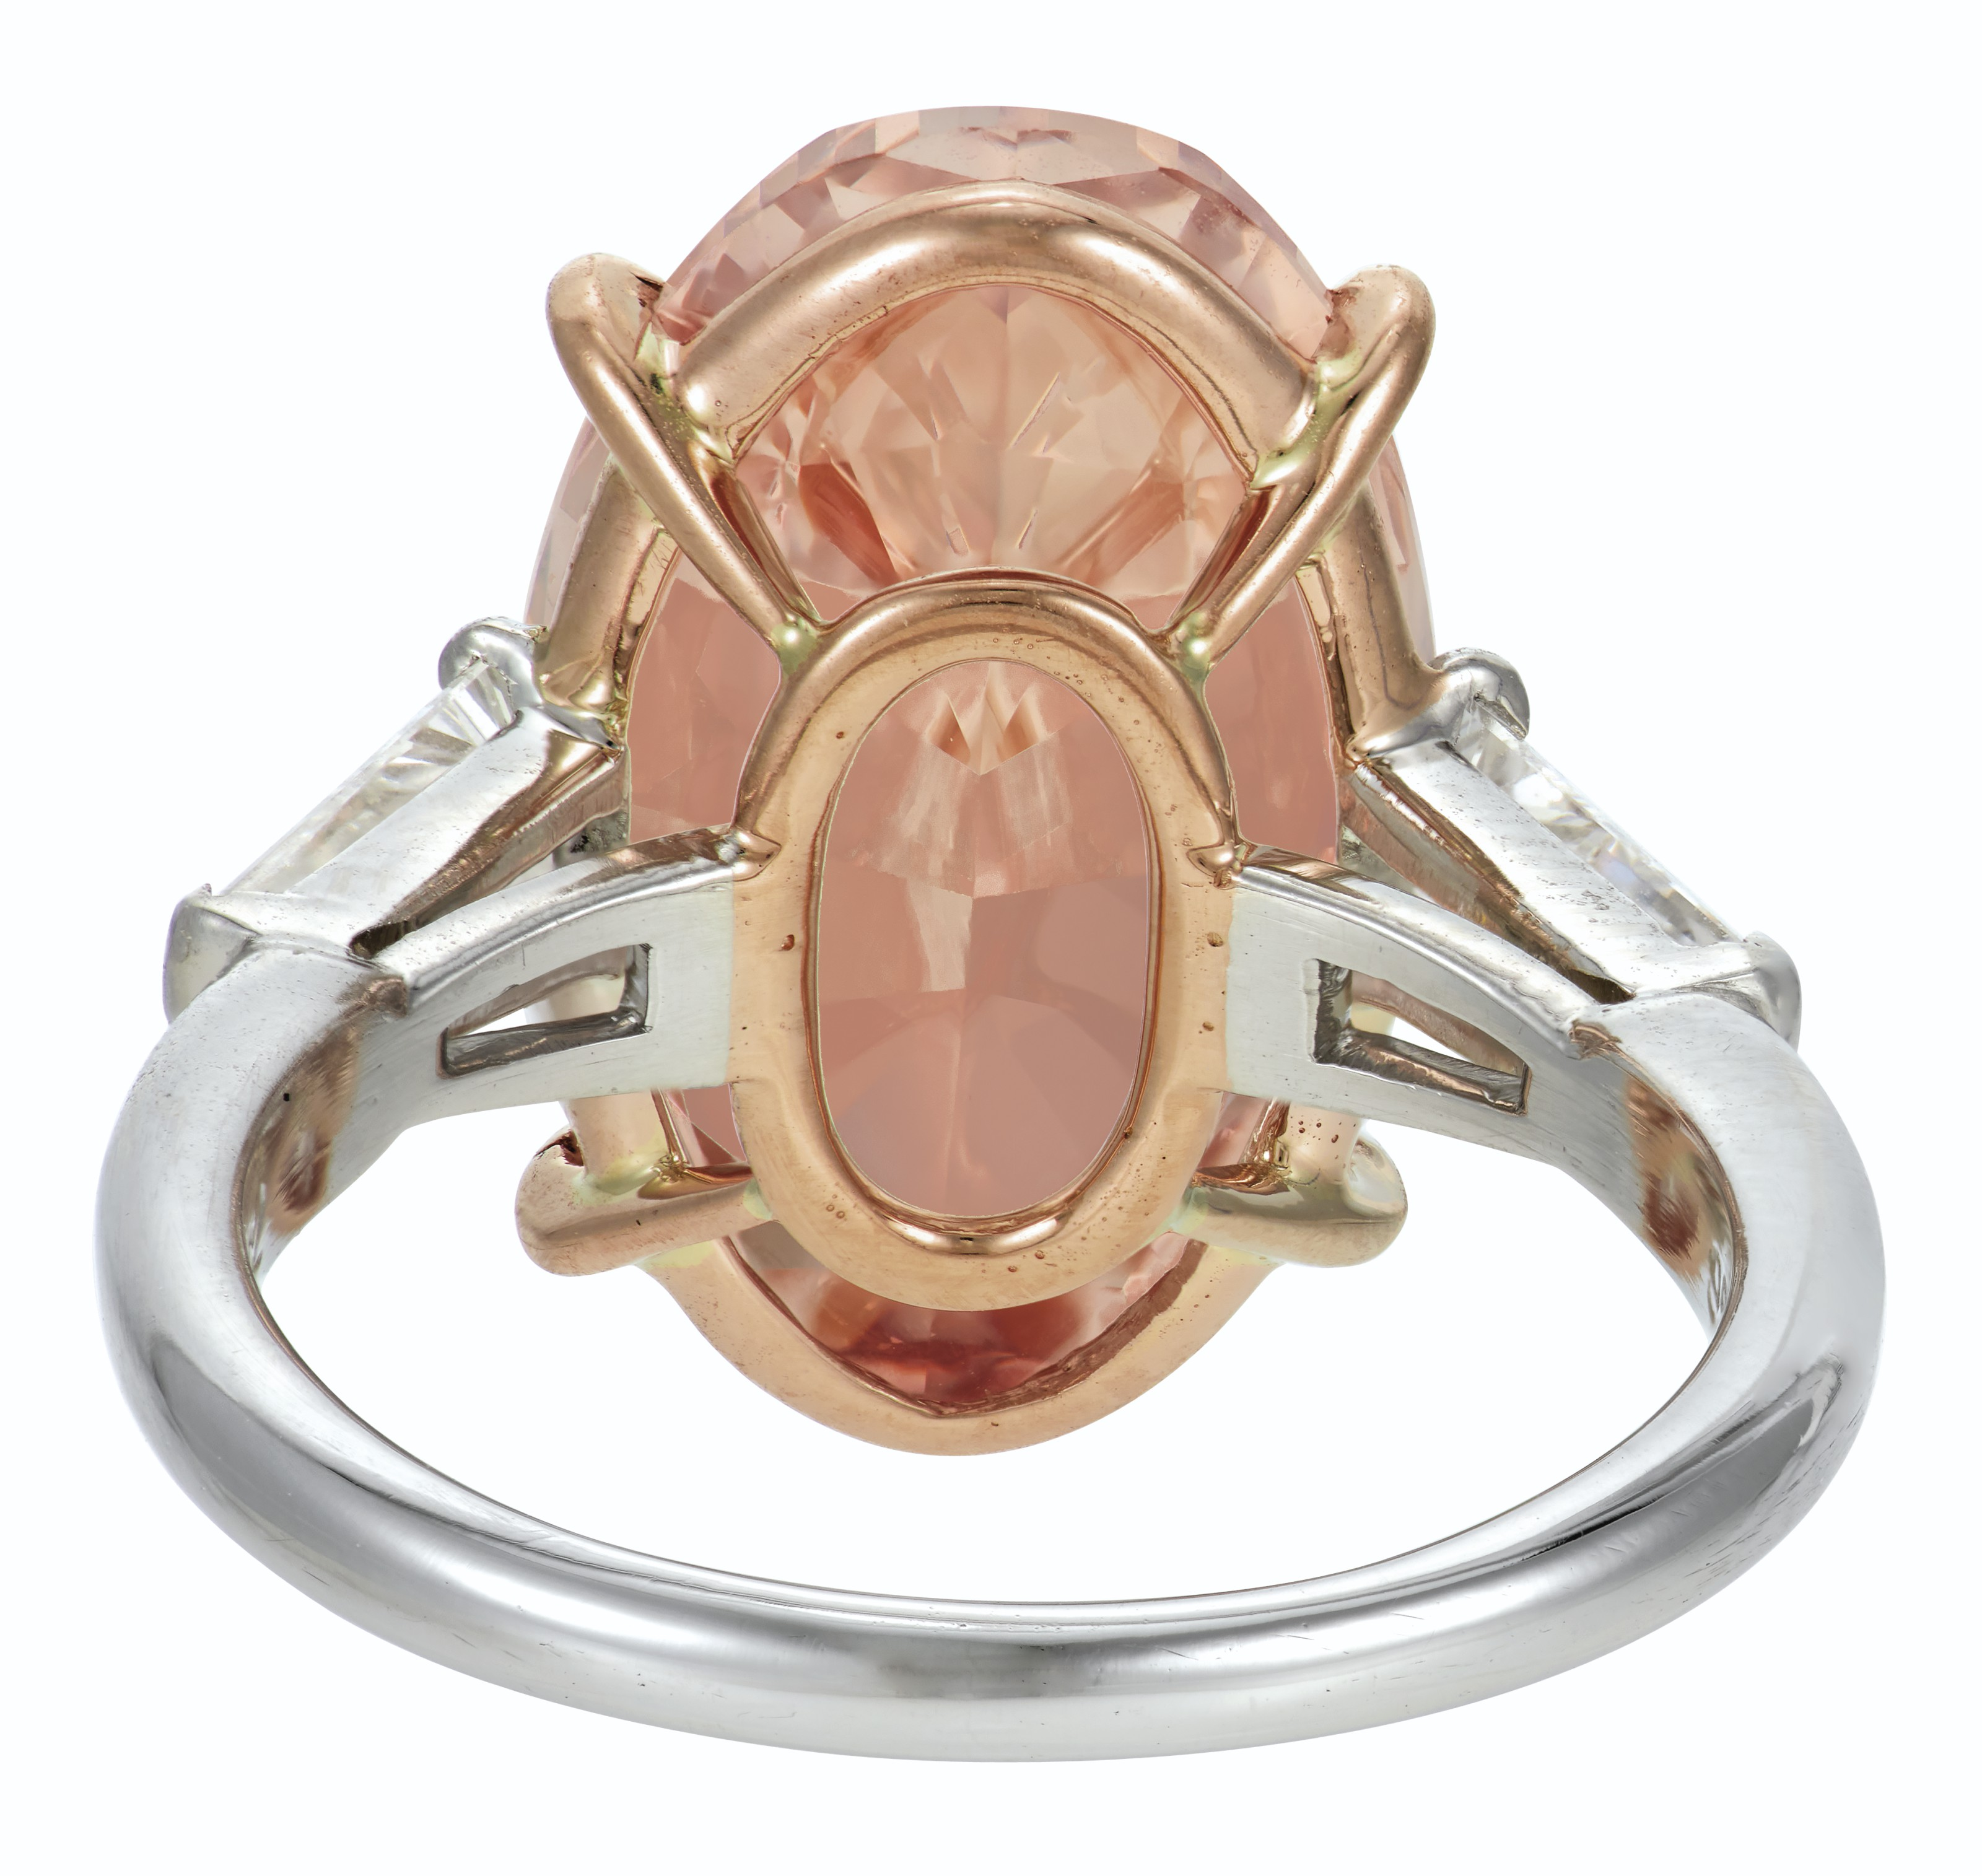 A RARE COLORED DIAMOND AND DIAMOND RING